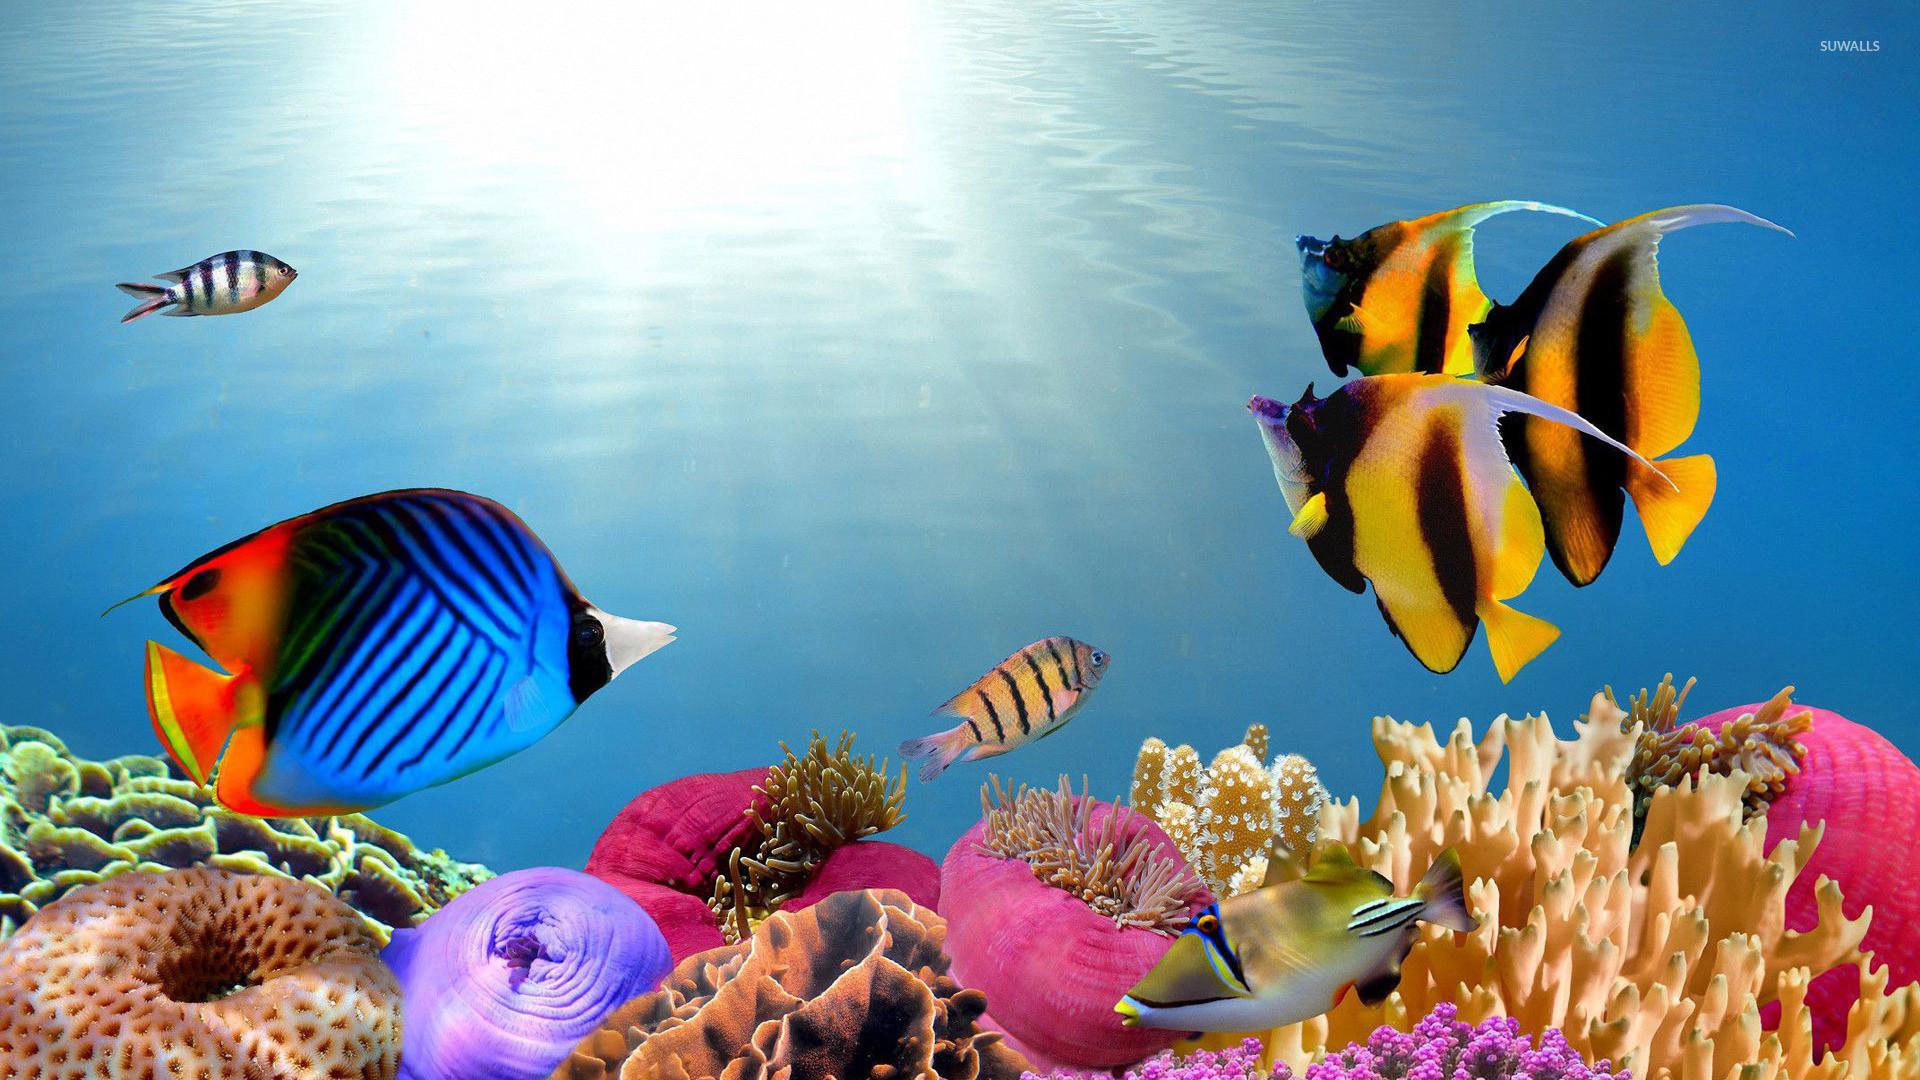 Saltwater Fishing Wallpaper Desktop – WallpaperSafari